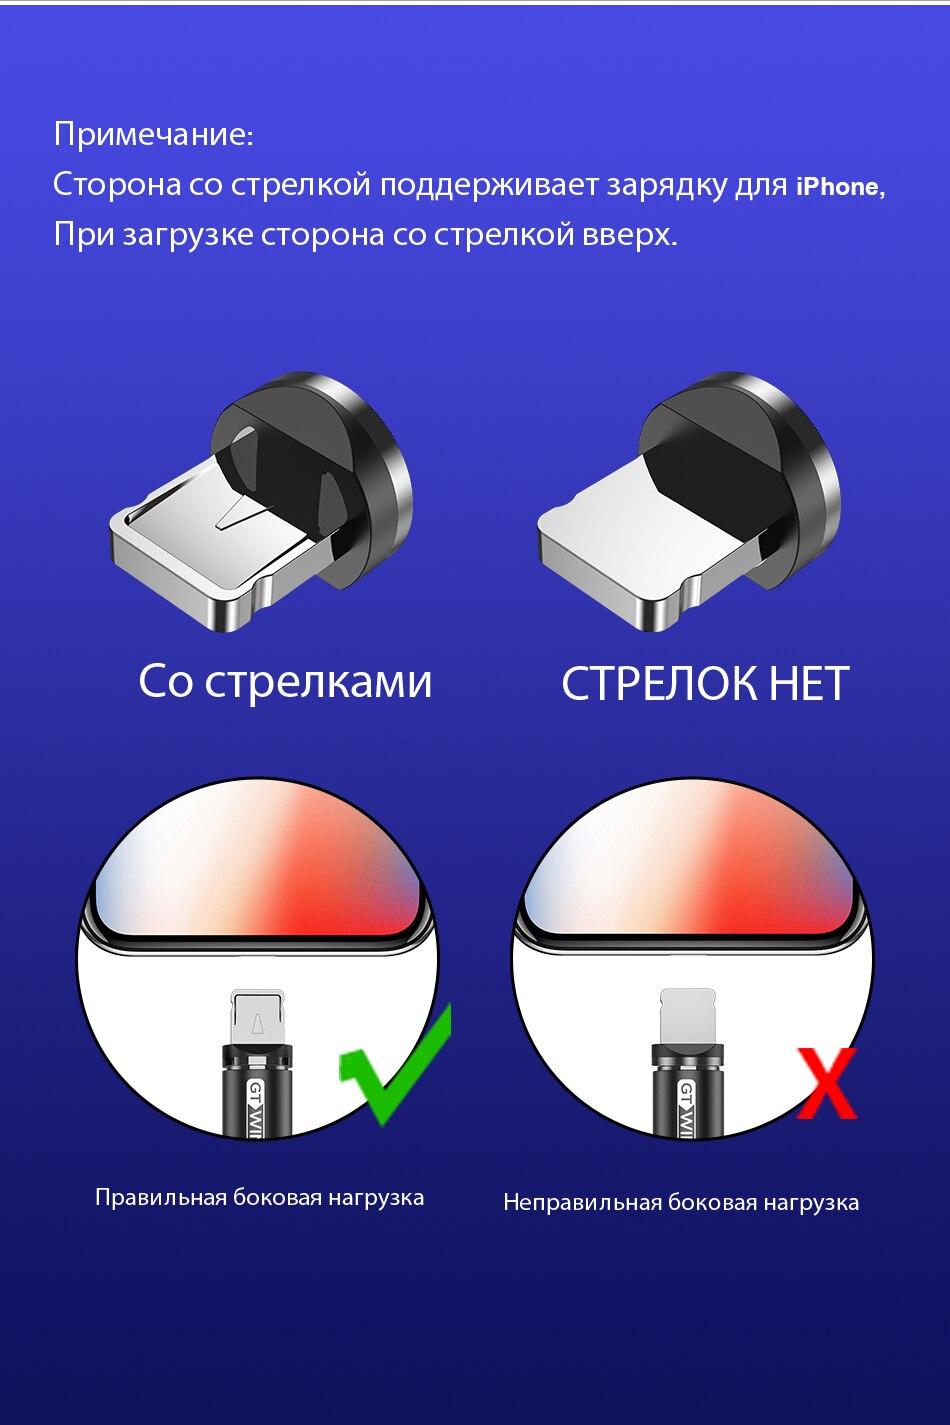 GTWIN 2м 3м Магнитный Micro Type C USB-кабель Адаптер для быстрой зарядки Зарядное устройство Магнитная зарядка для iPhone 11 pro max Xr X 8 7 6 плюс 6 s 5 s плюс iPad Samsung S9 S8 Note 7 mi Xiaomi Huawei P30 P20 Mate